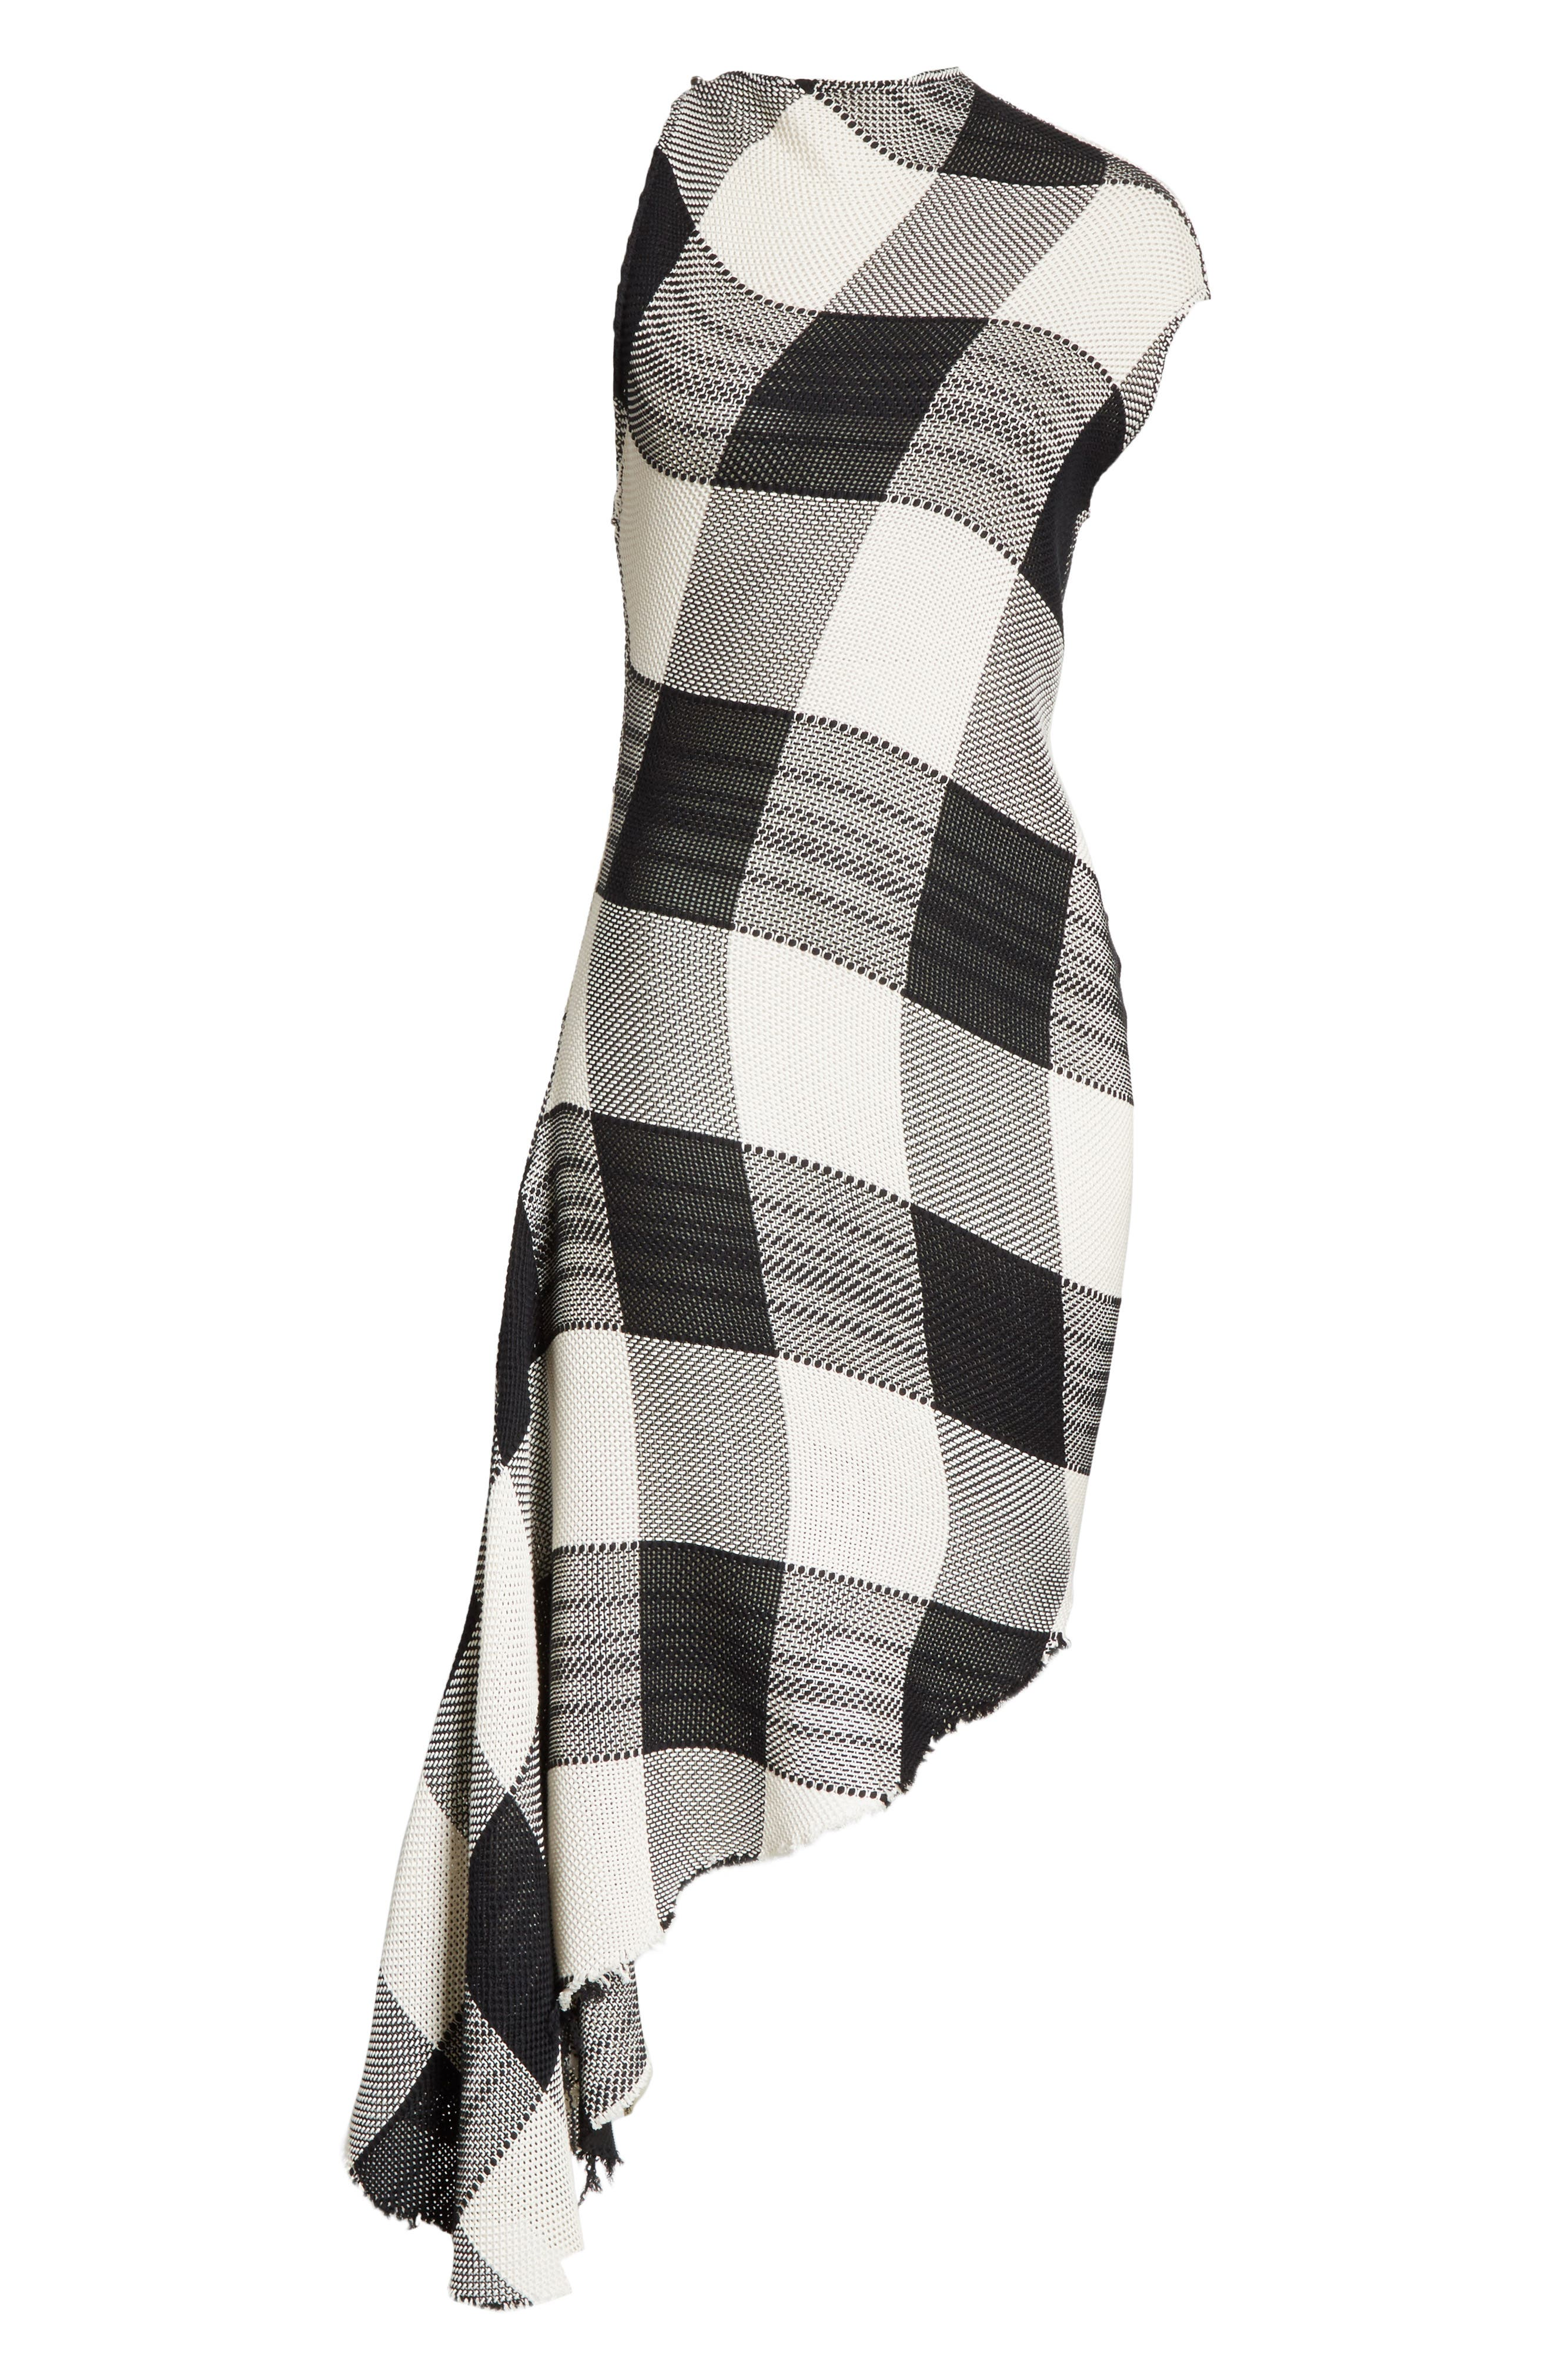 Marques'Almeida Asymmetrical Gingham Sheath Dress,                             Alternate thumbnail 7, color,                             Black/White